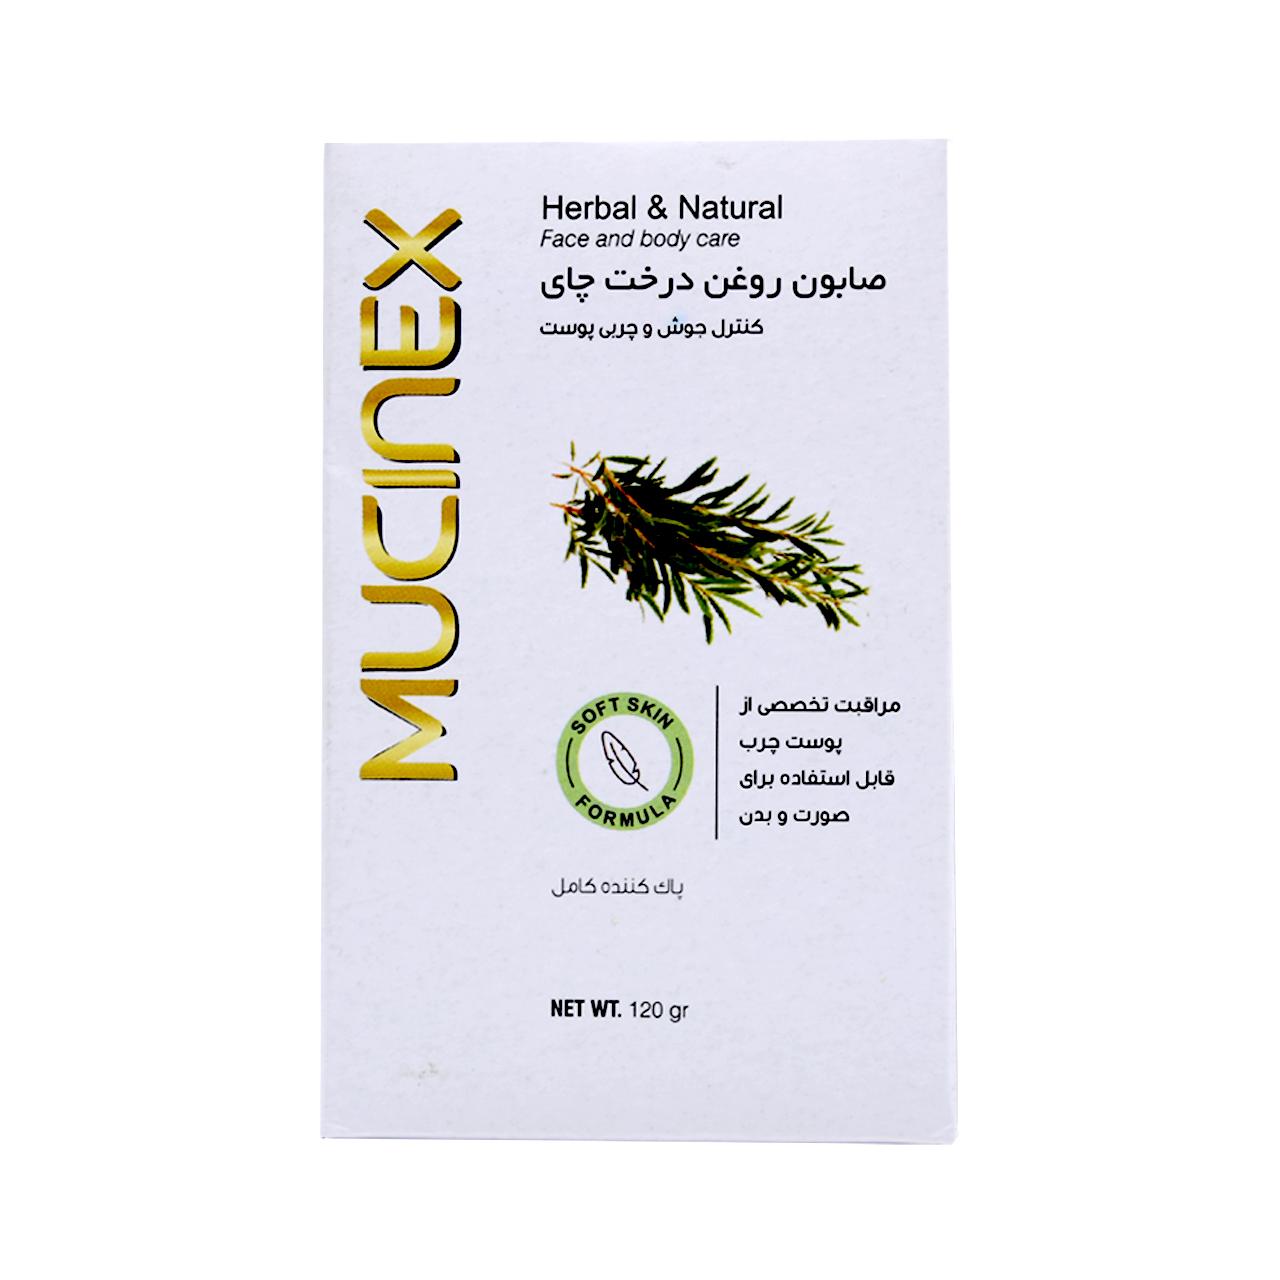 صابون شستشو ماسینکس مدل tea tree oil وزن 120 گرم